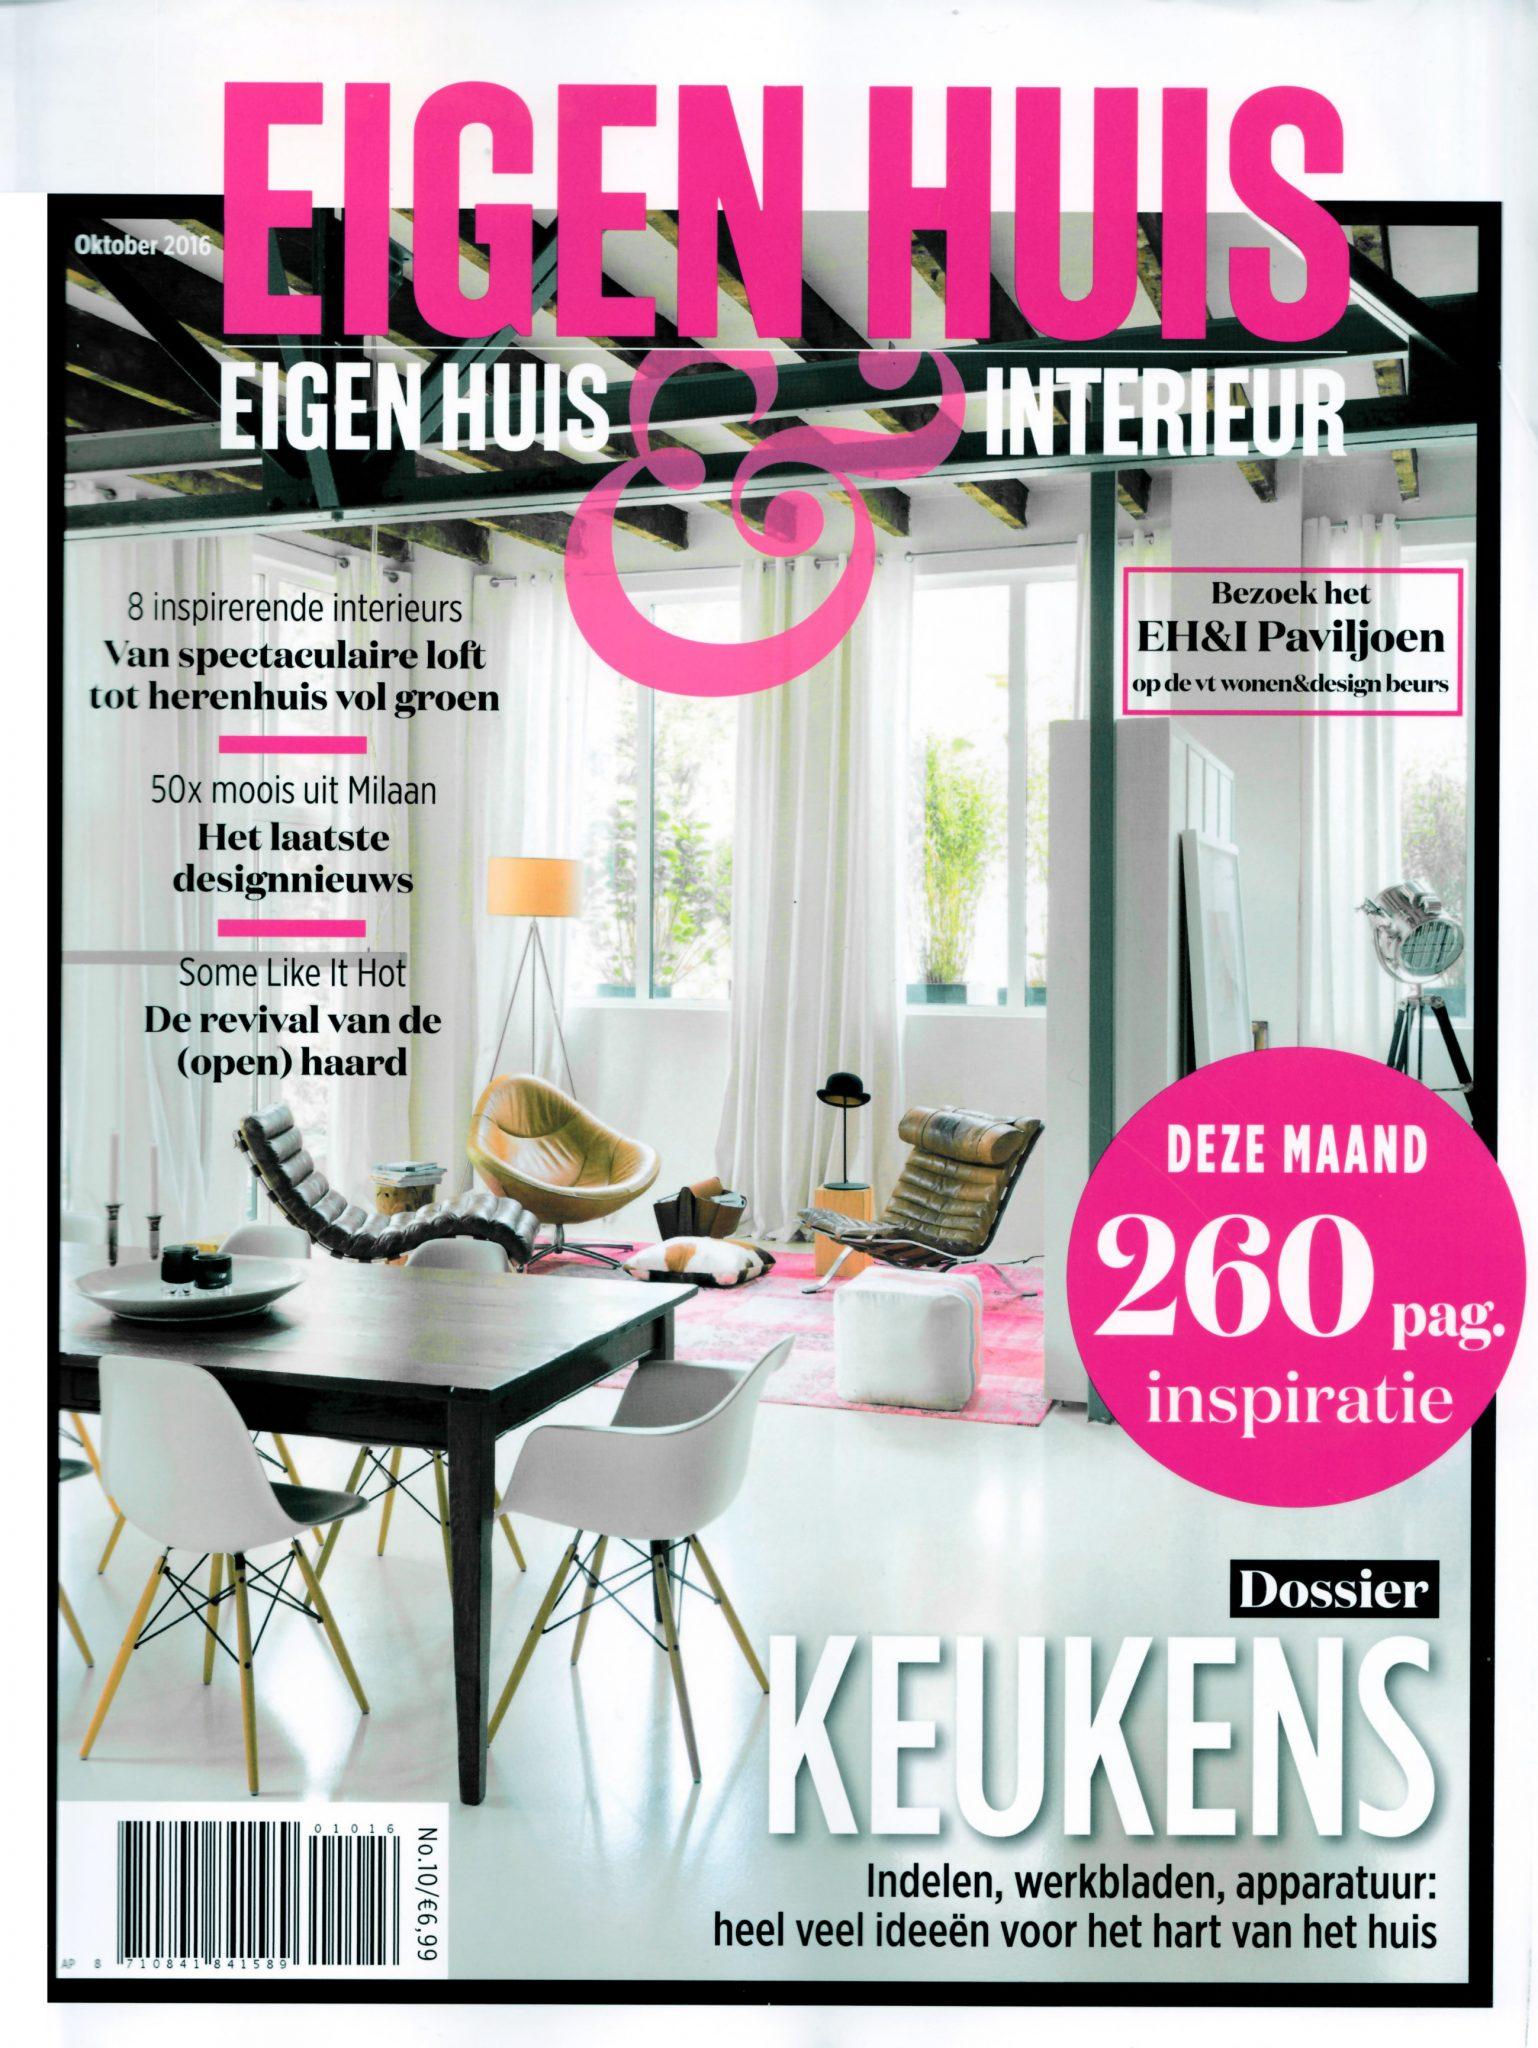 Eigen Huis & Interieur (Netherlands) October 2016 - FRAMES 2.5